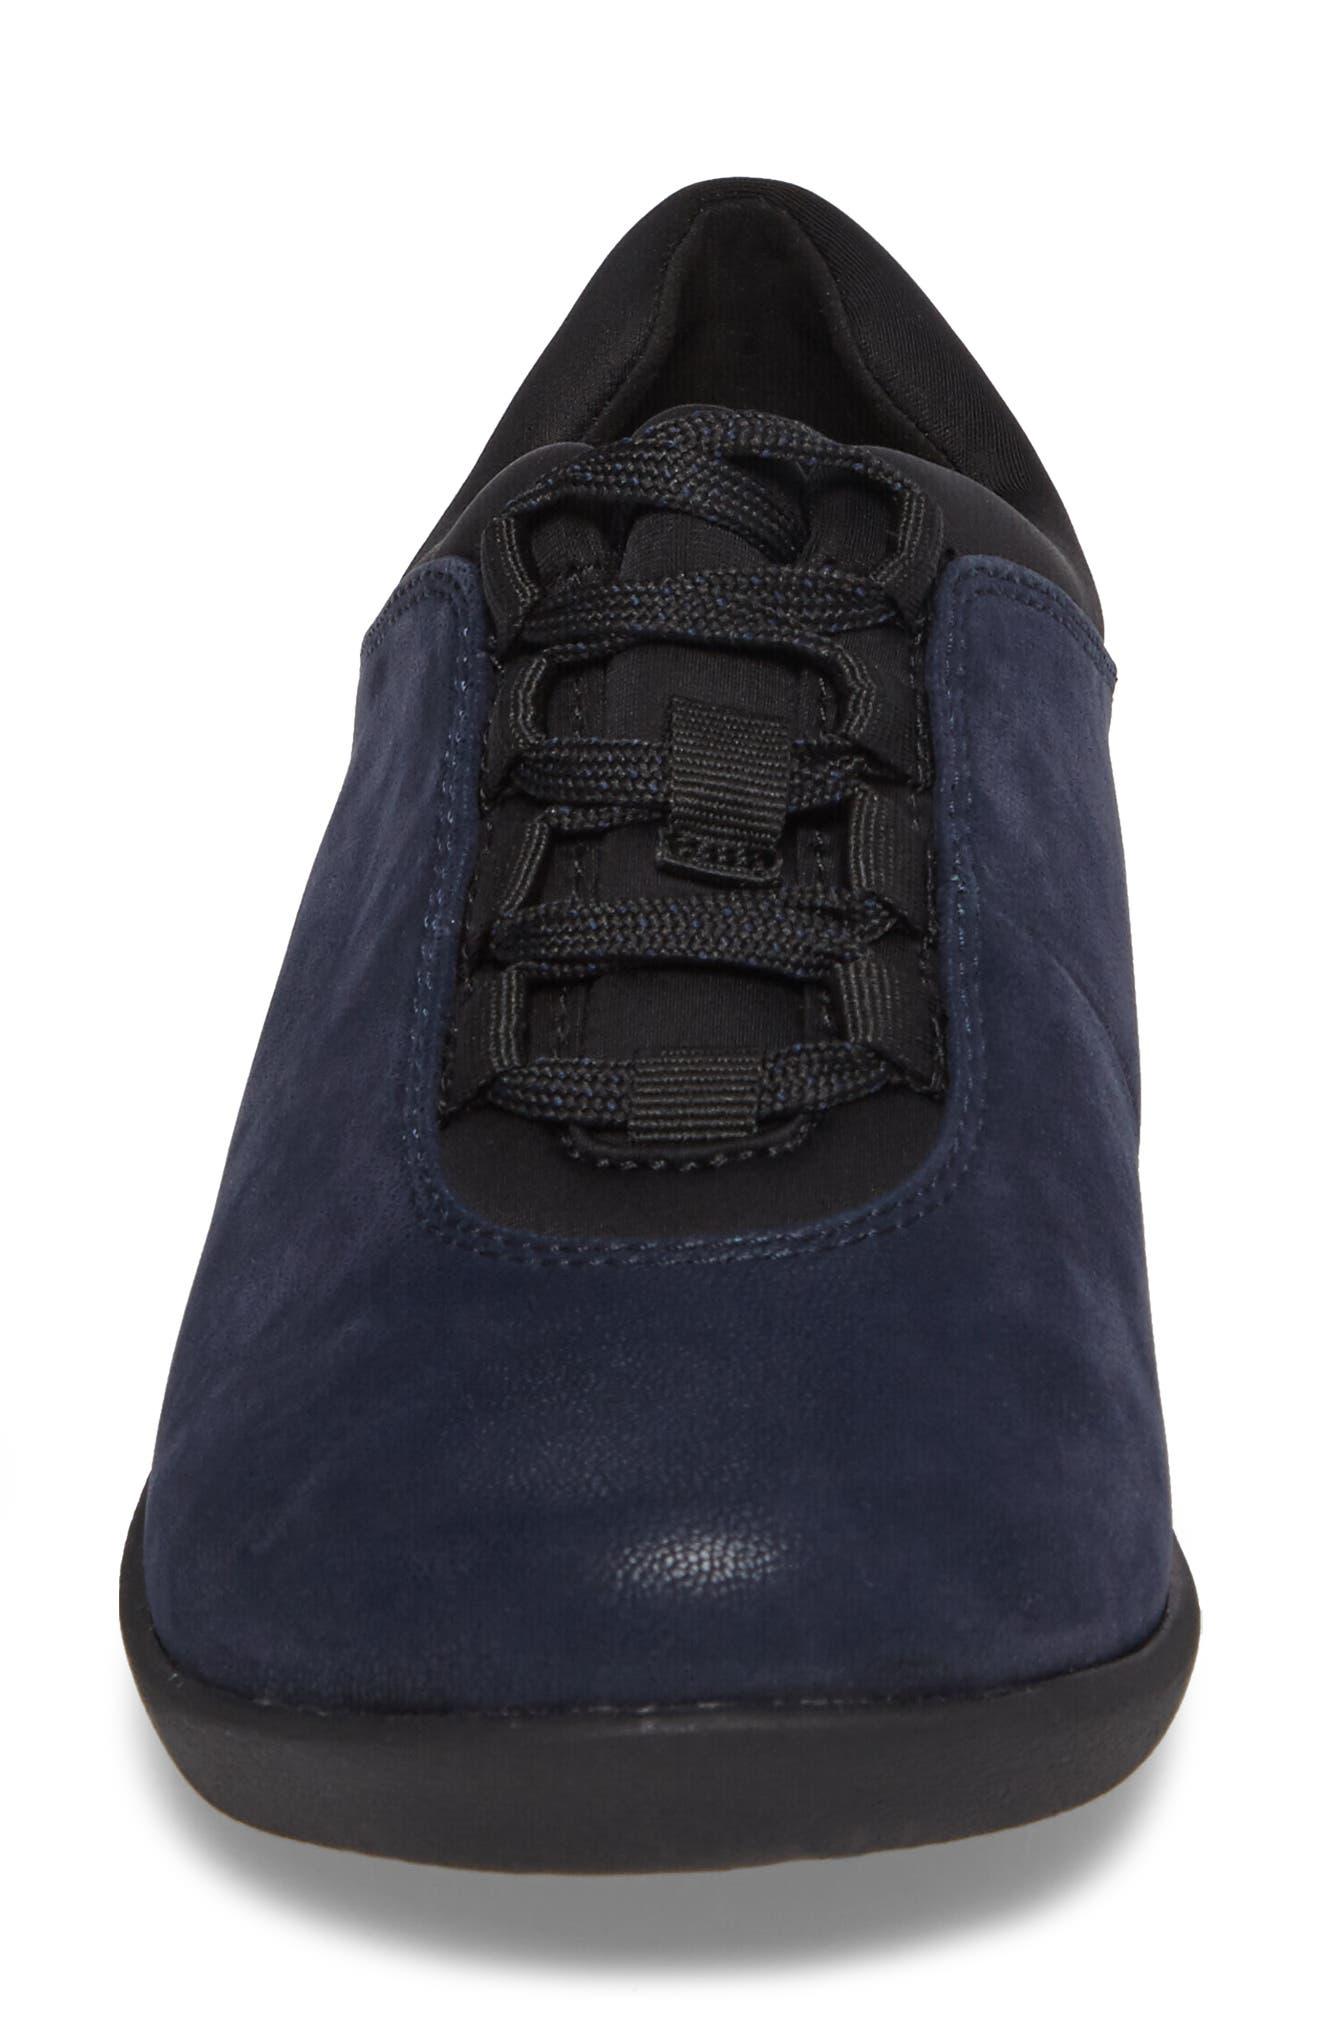 Sillian Pine Sneaker,                             Alternate thumbnail 4, color,                             Navy Canvas